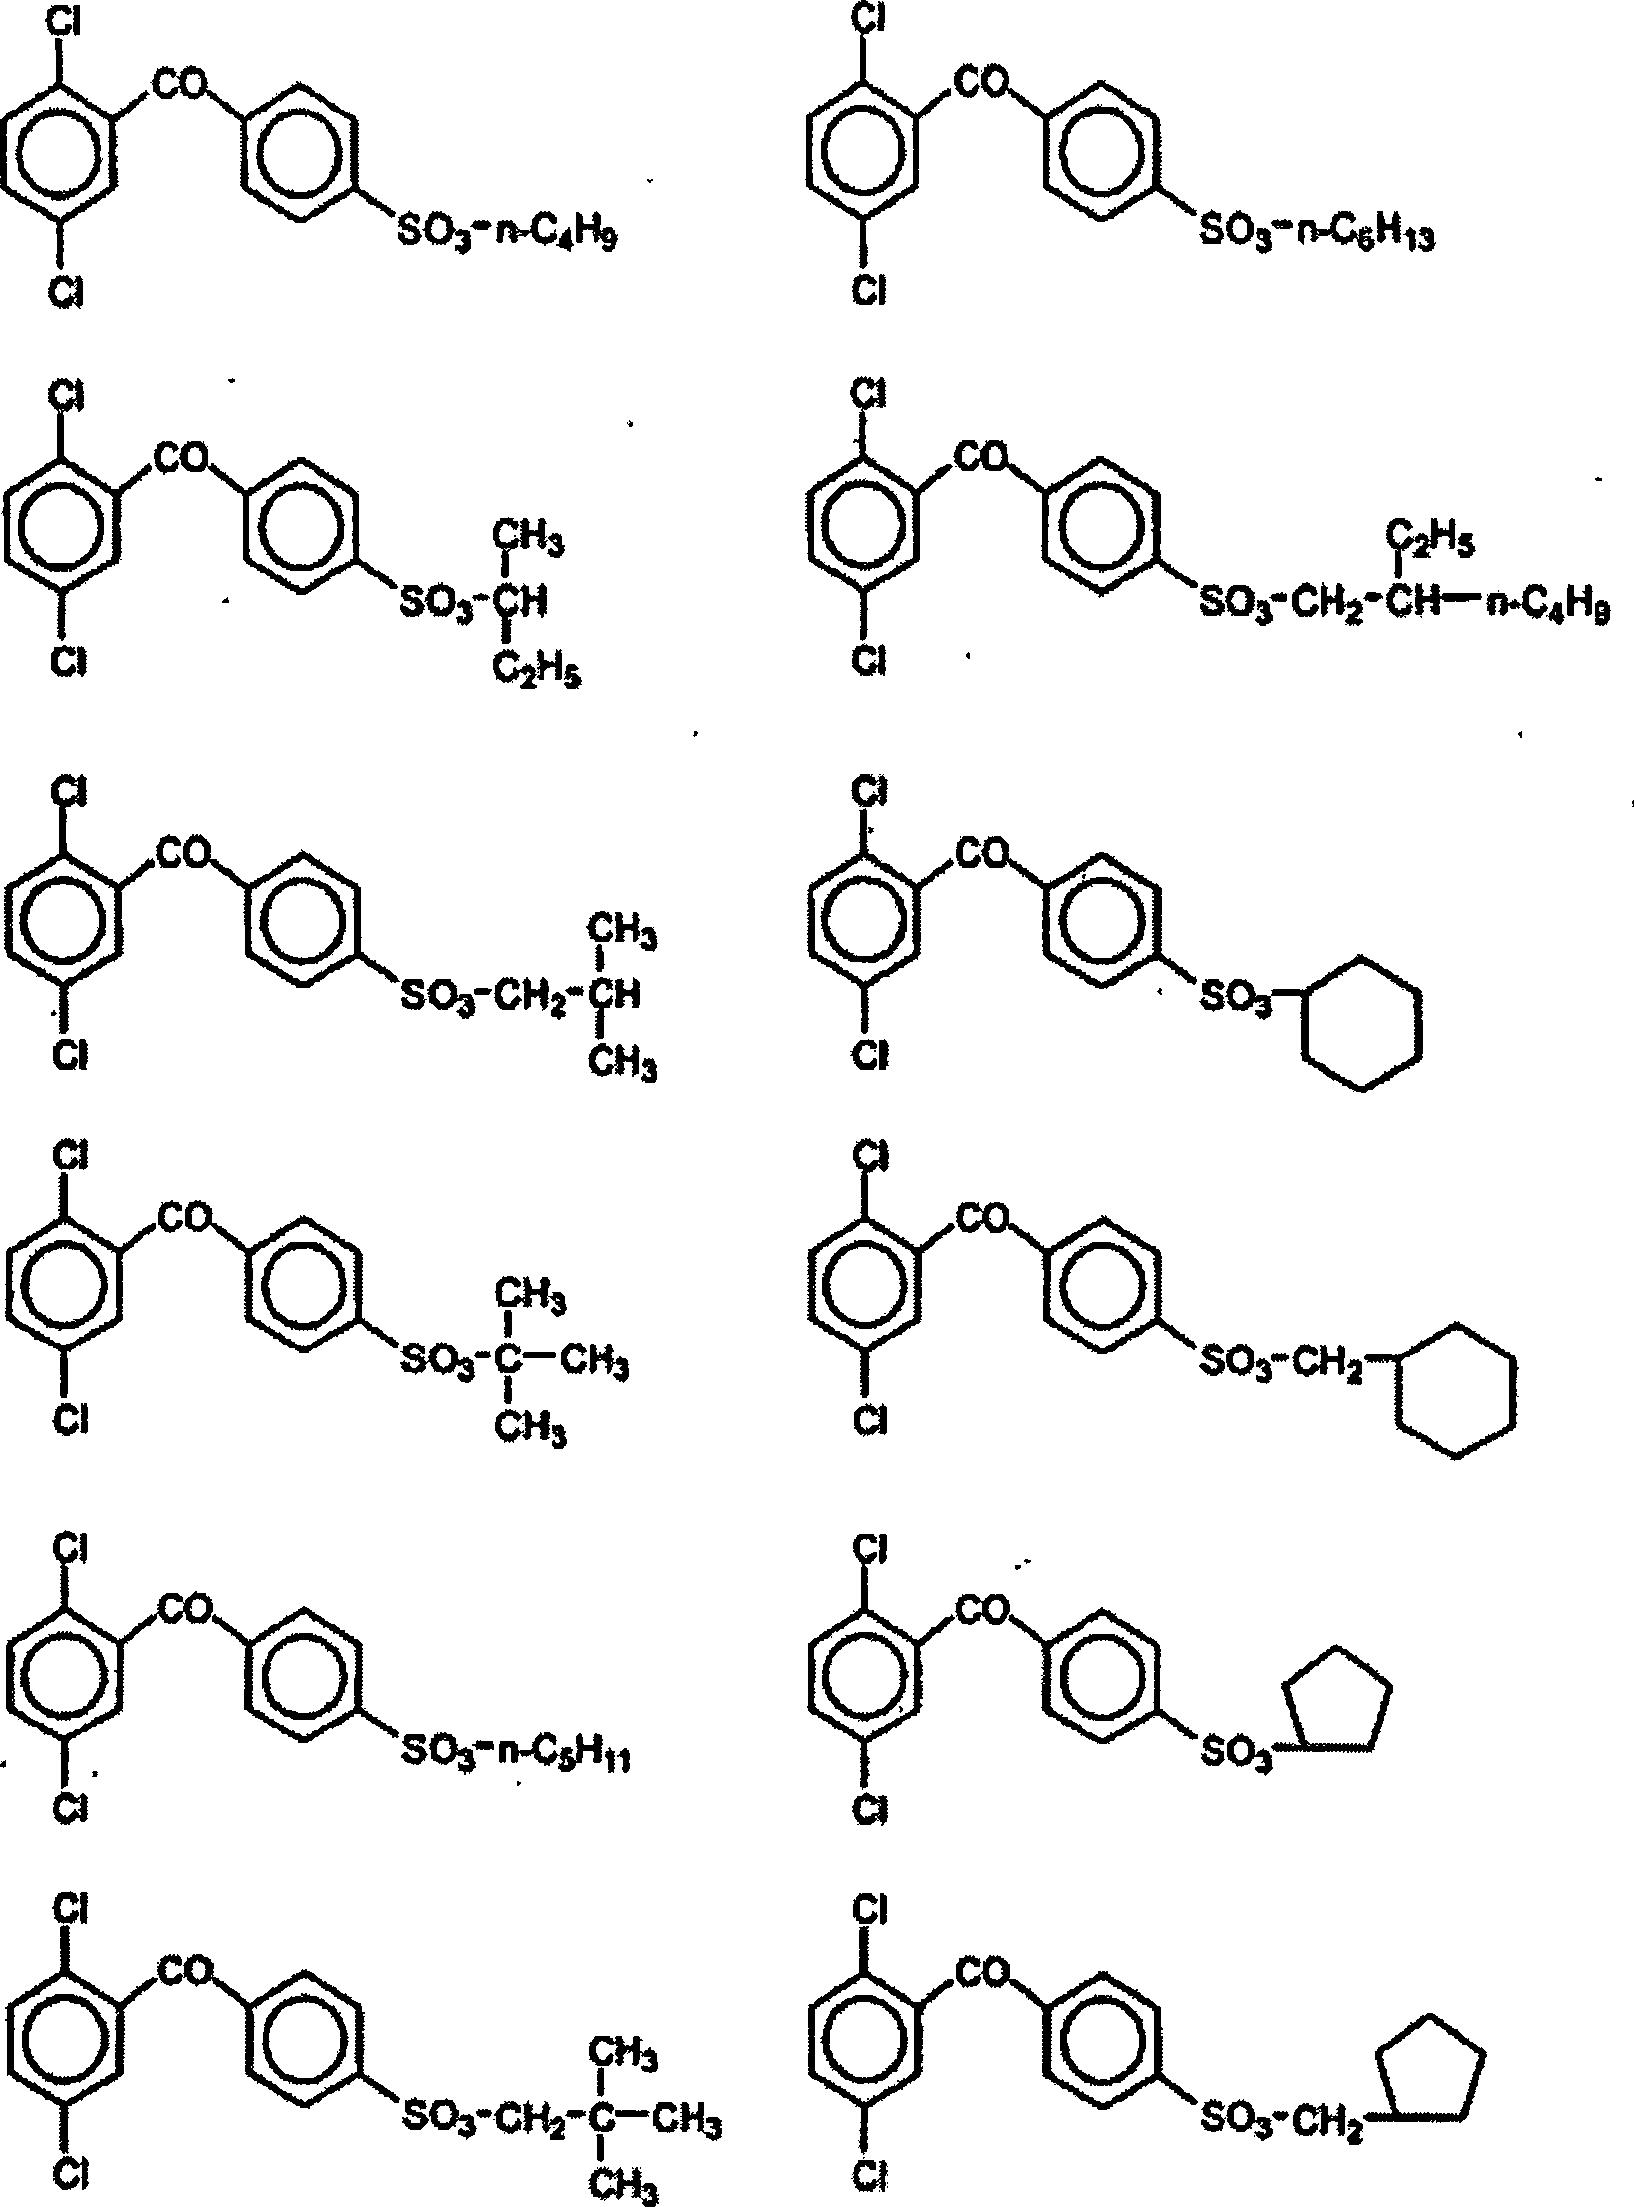 DE60314816T2 - New aromatic sulfonic acid ester derivatives ...